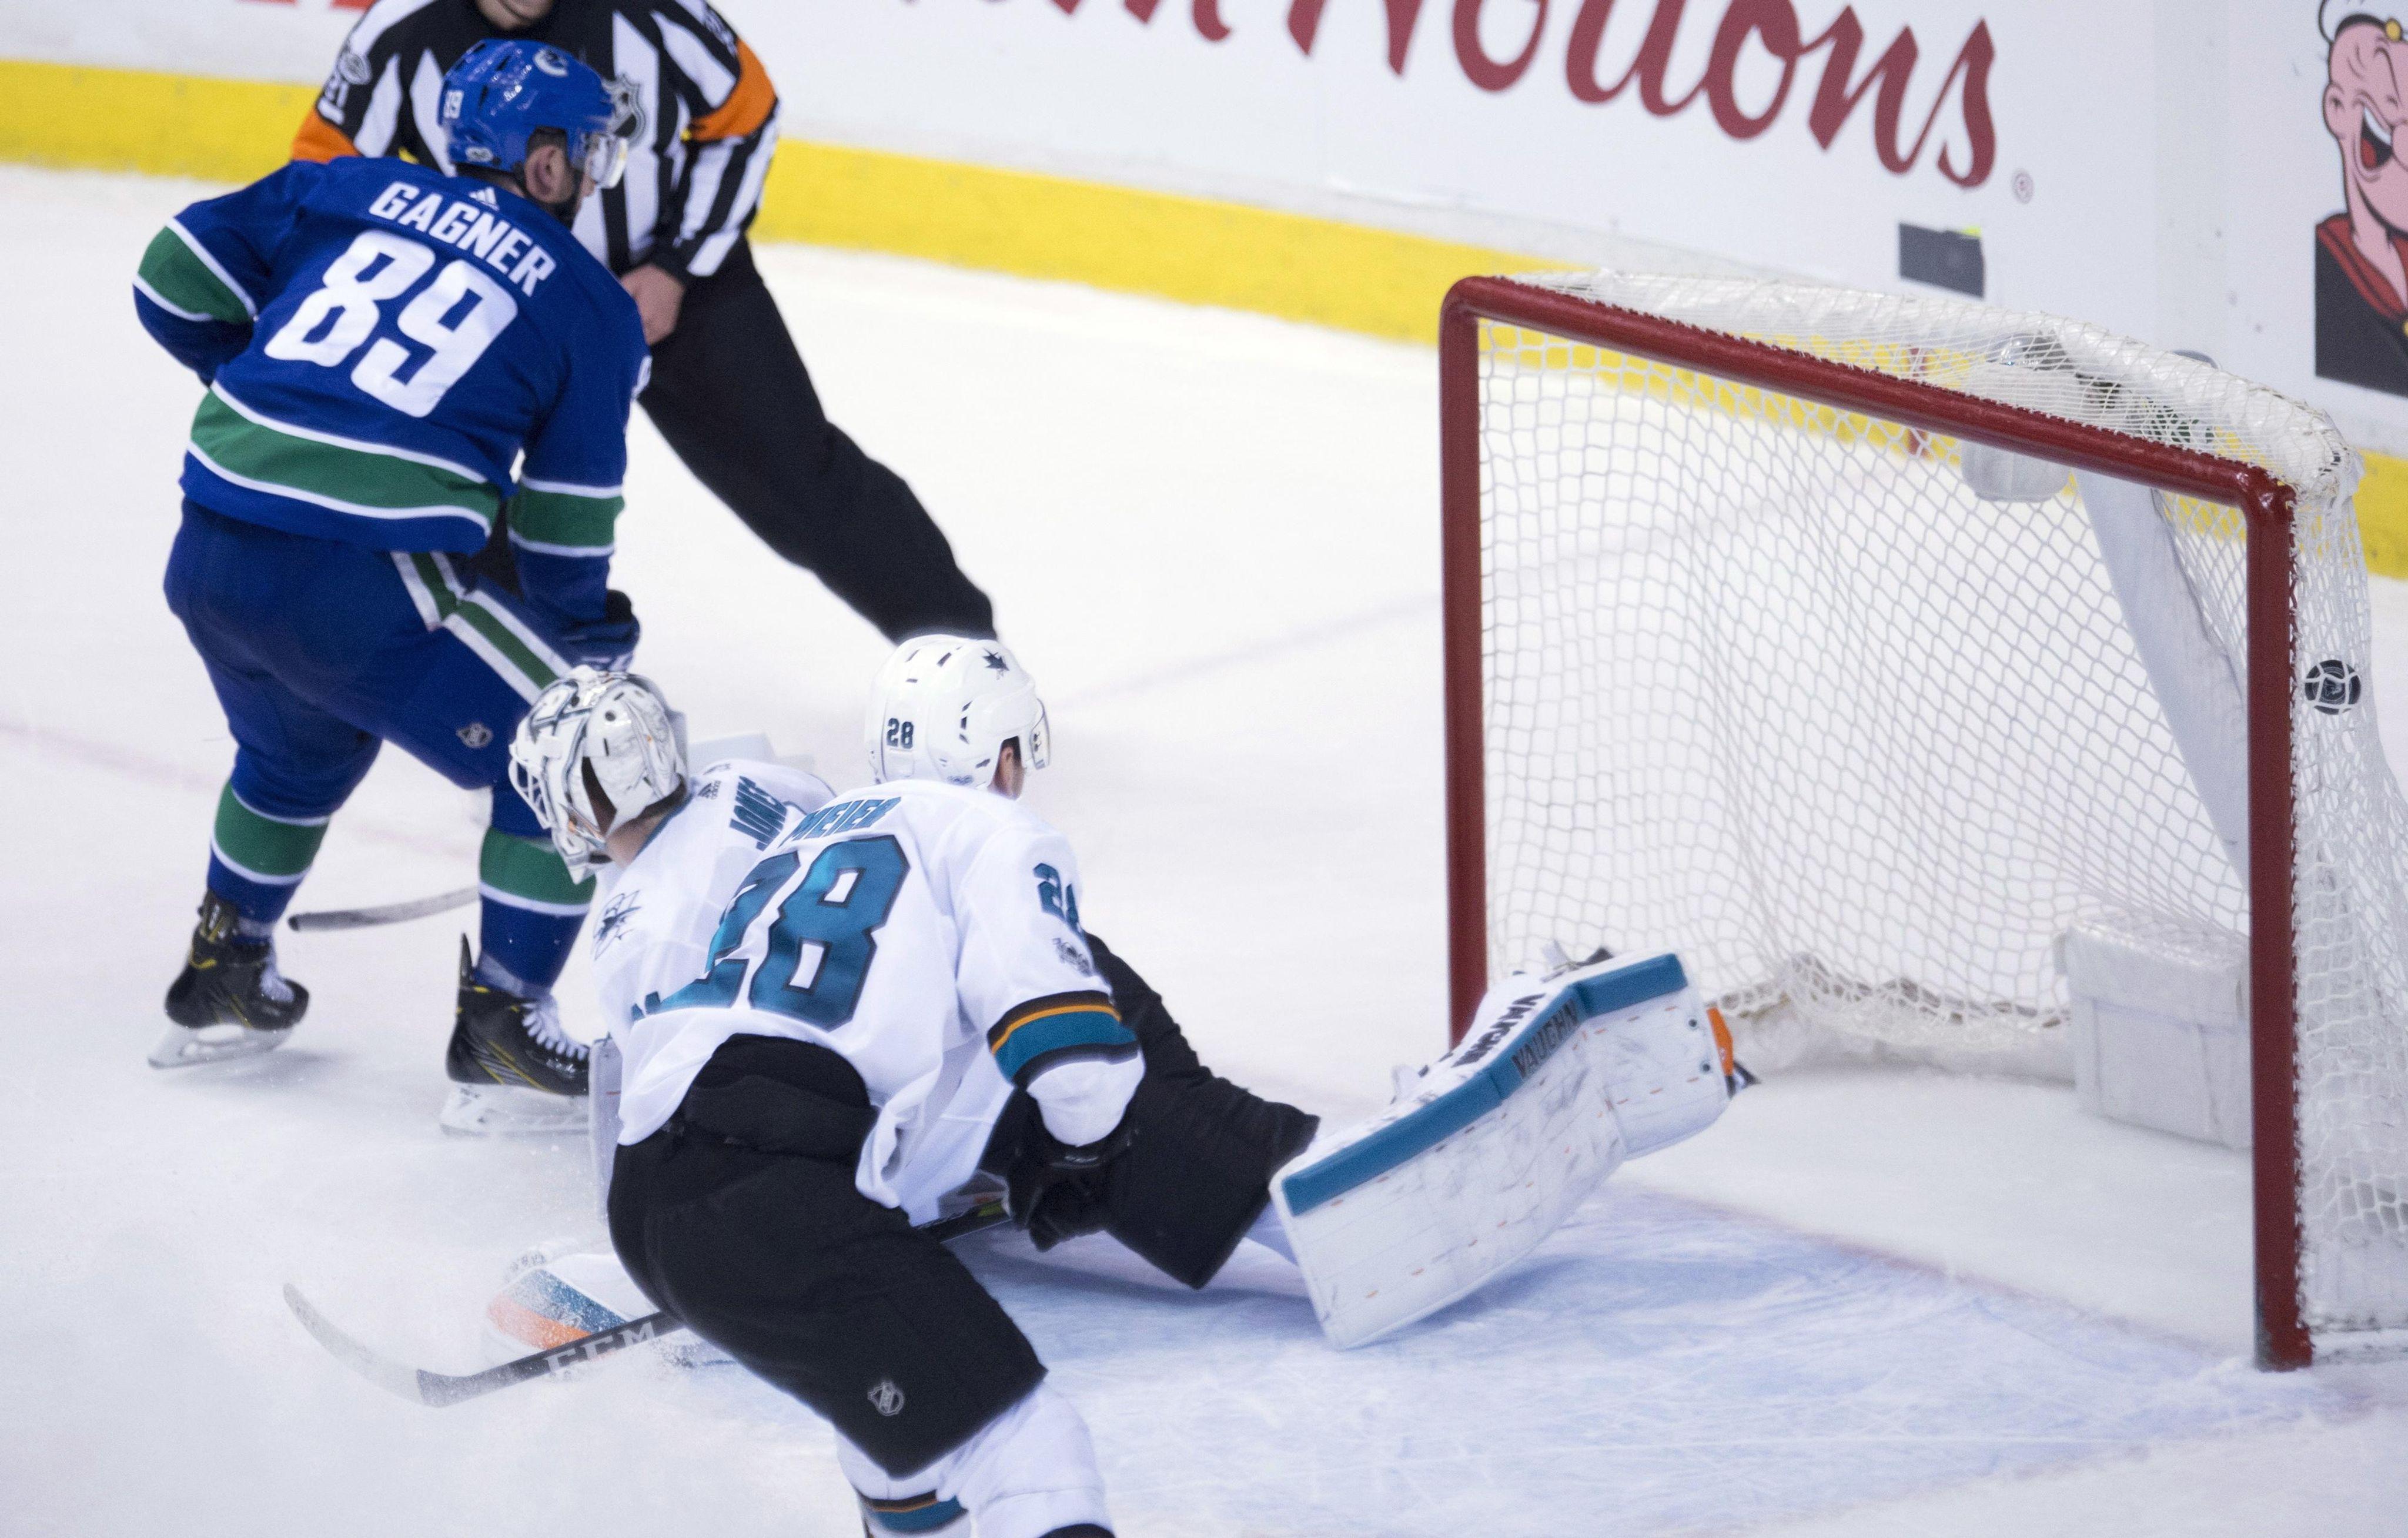 Sharks_canucks_hockey_45886_s4096x2616